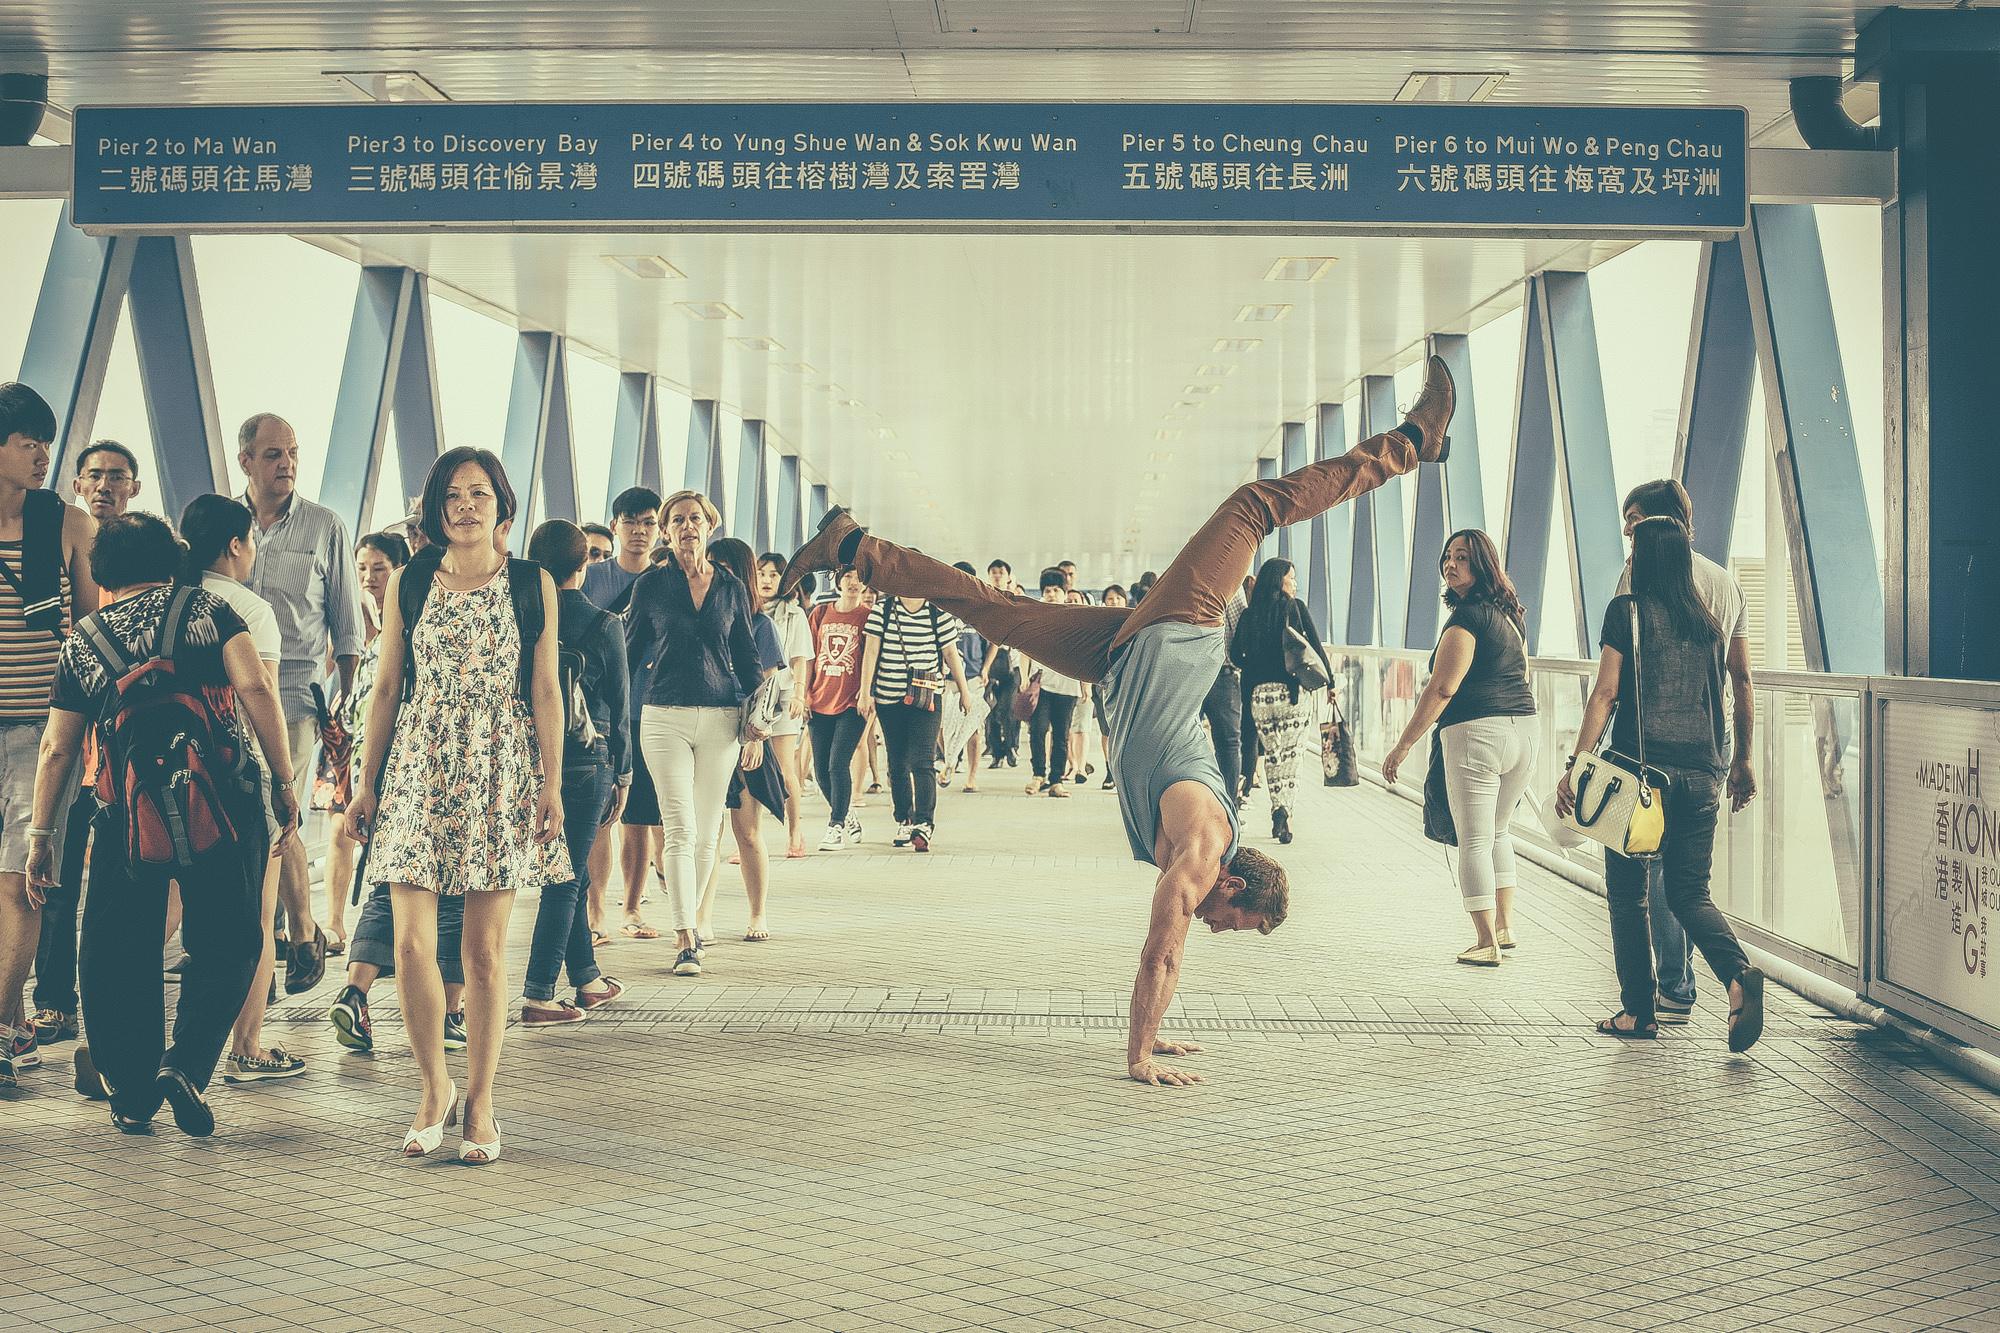 Darrel Erxleben, Personal Trainer and Yoga Teacher living in Hong Kong